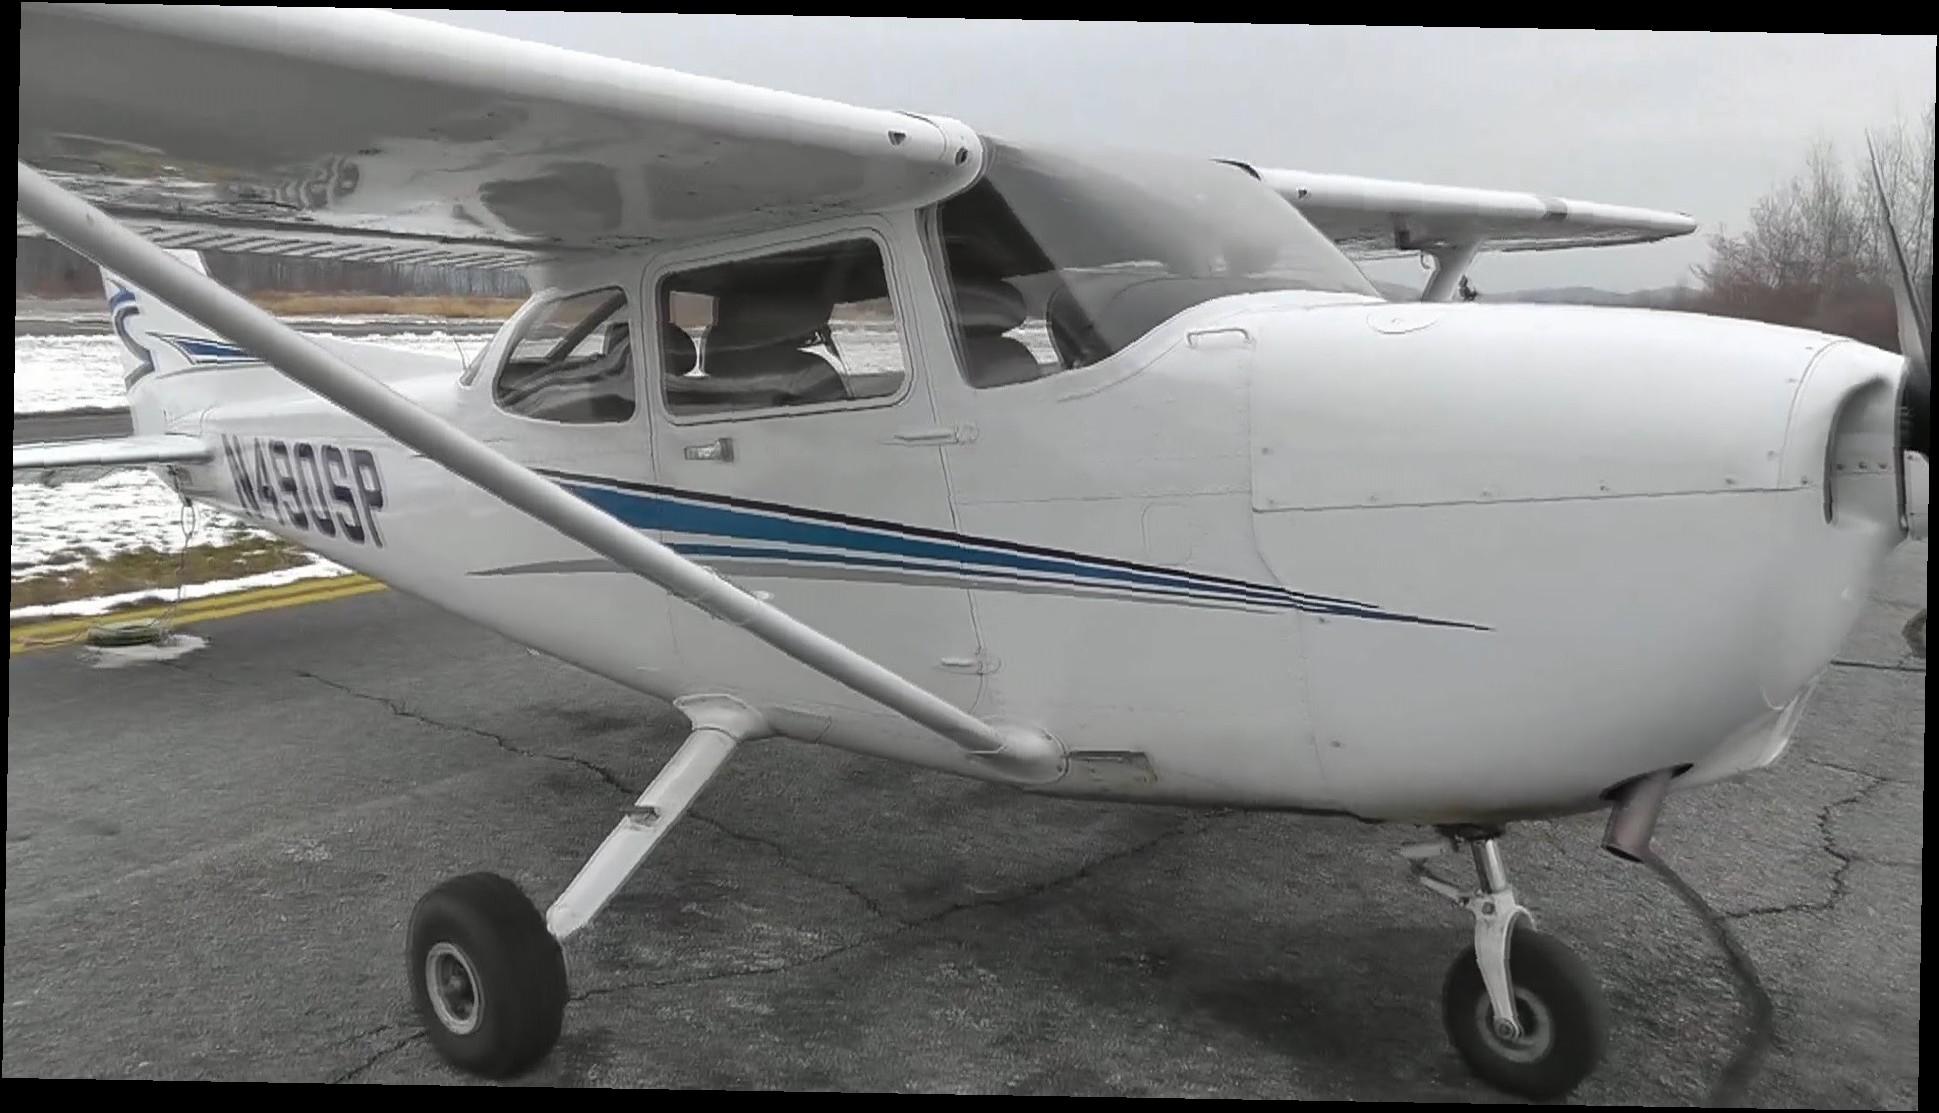 Бронирование авиабилетов Колорадо Плейнс Риджинал (Colorado Plains Regional Airport) коды IATA: AKO ICAO: KAKO город: Колорадо Плейнс Риджинал (Akron, CO) страна: США (United States)